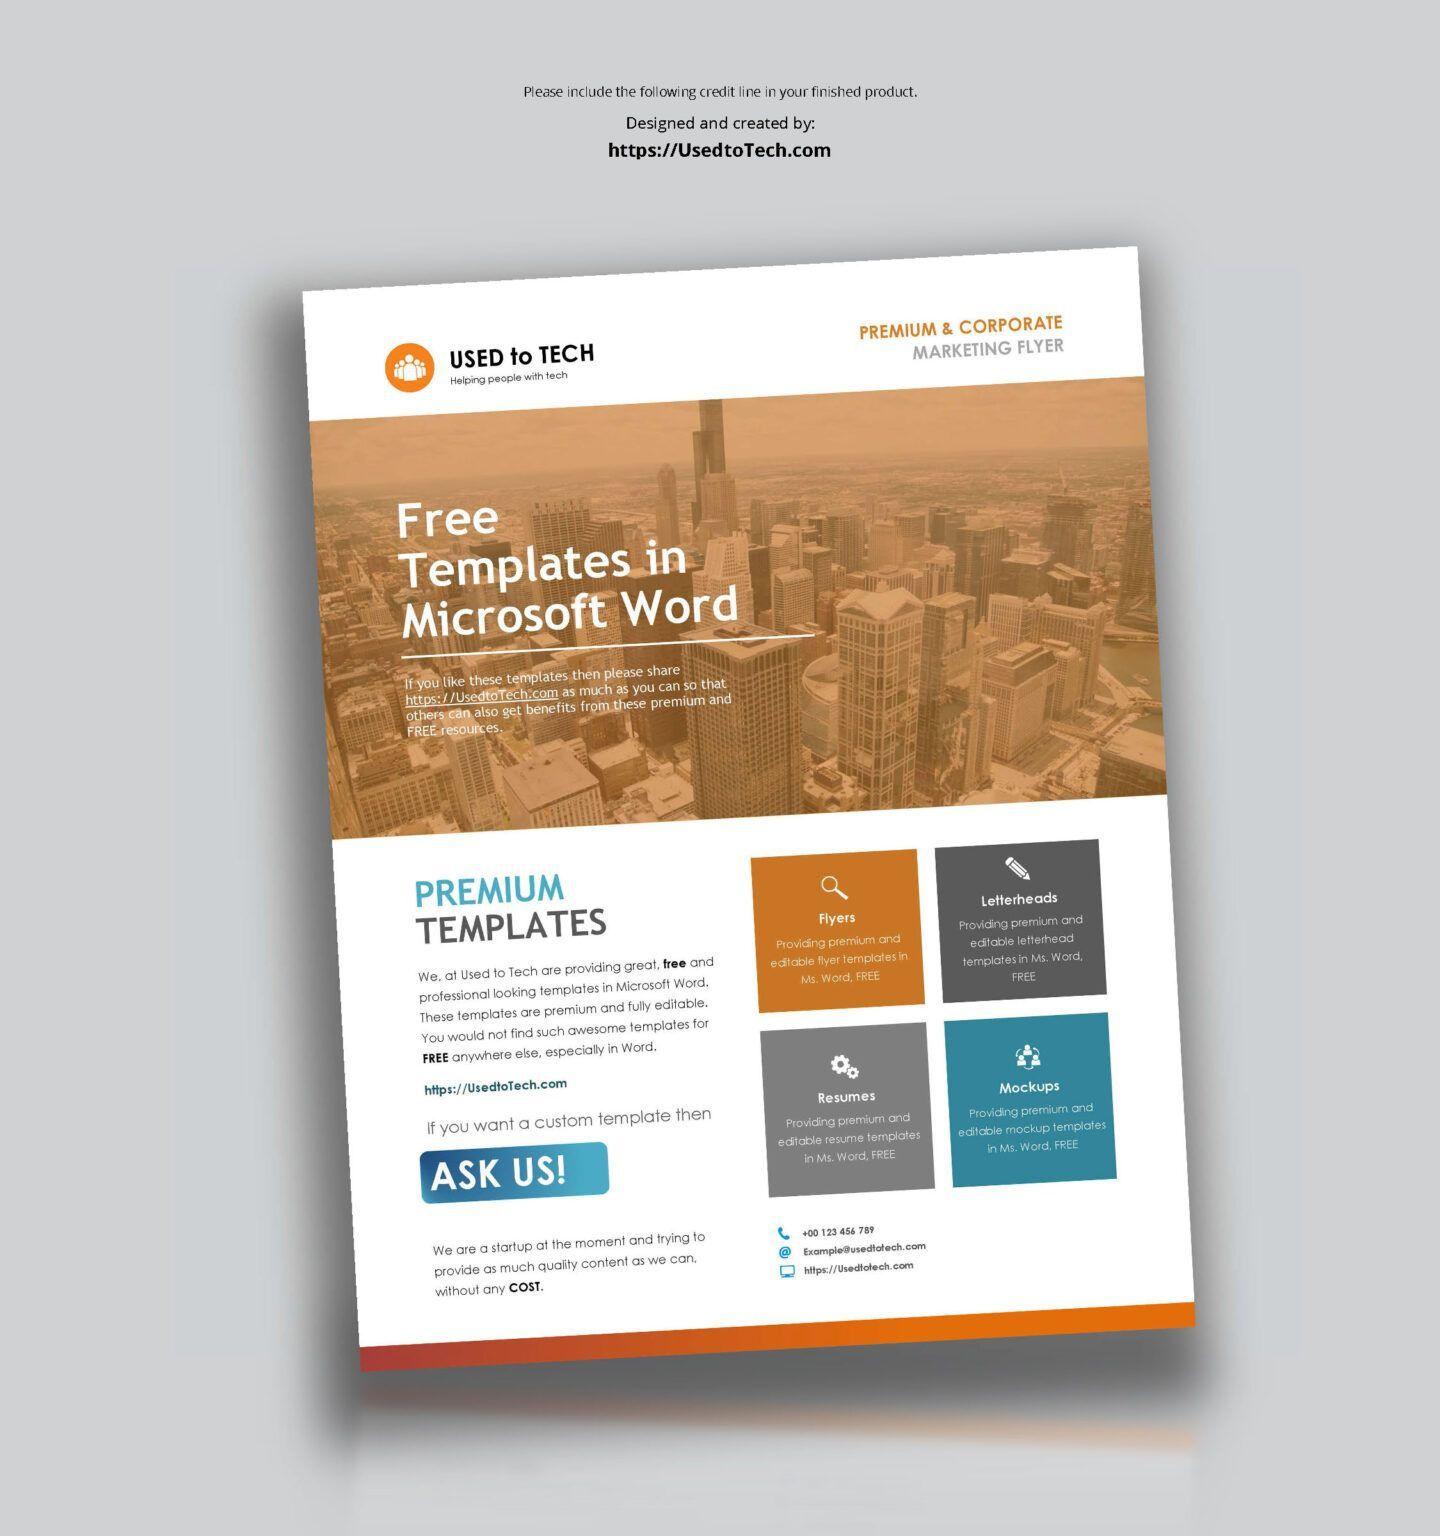 002 Beautiful Template Brochure For Microsoft Word Free Design  Flyer Bowling Tri Fold 2010Full